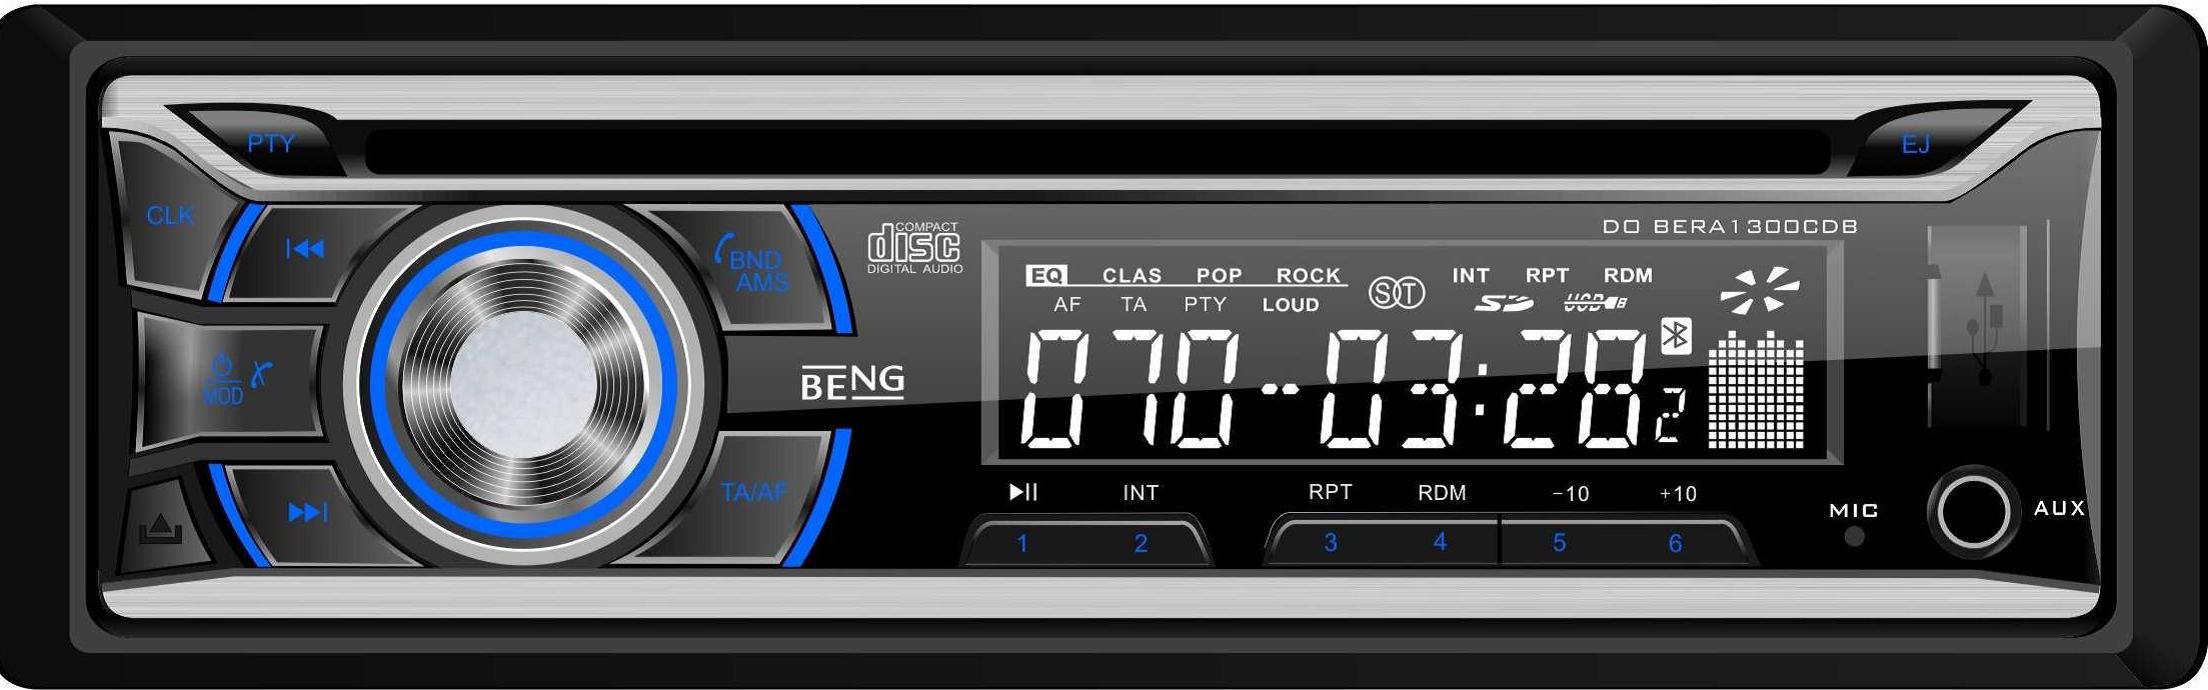 Autorádio BENG s CD,MP3,USB,SD/MMC 4x45W